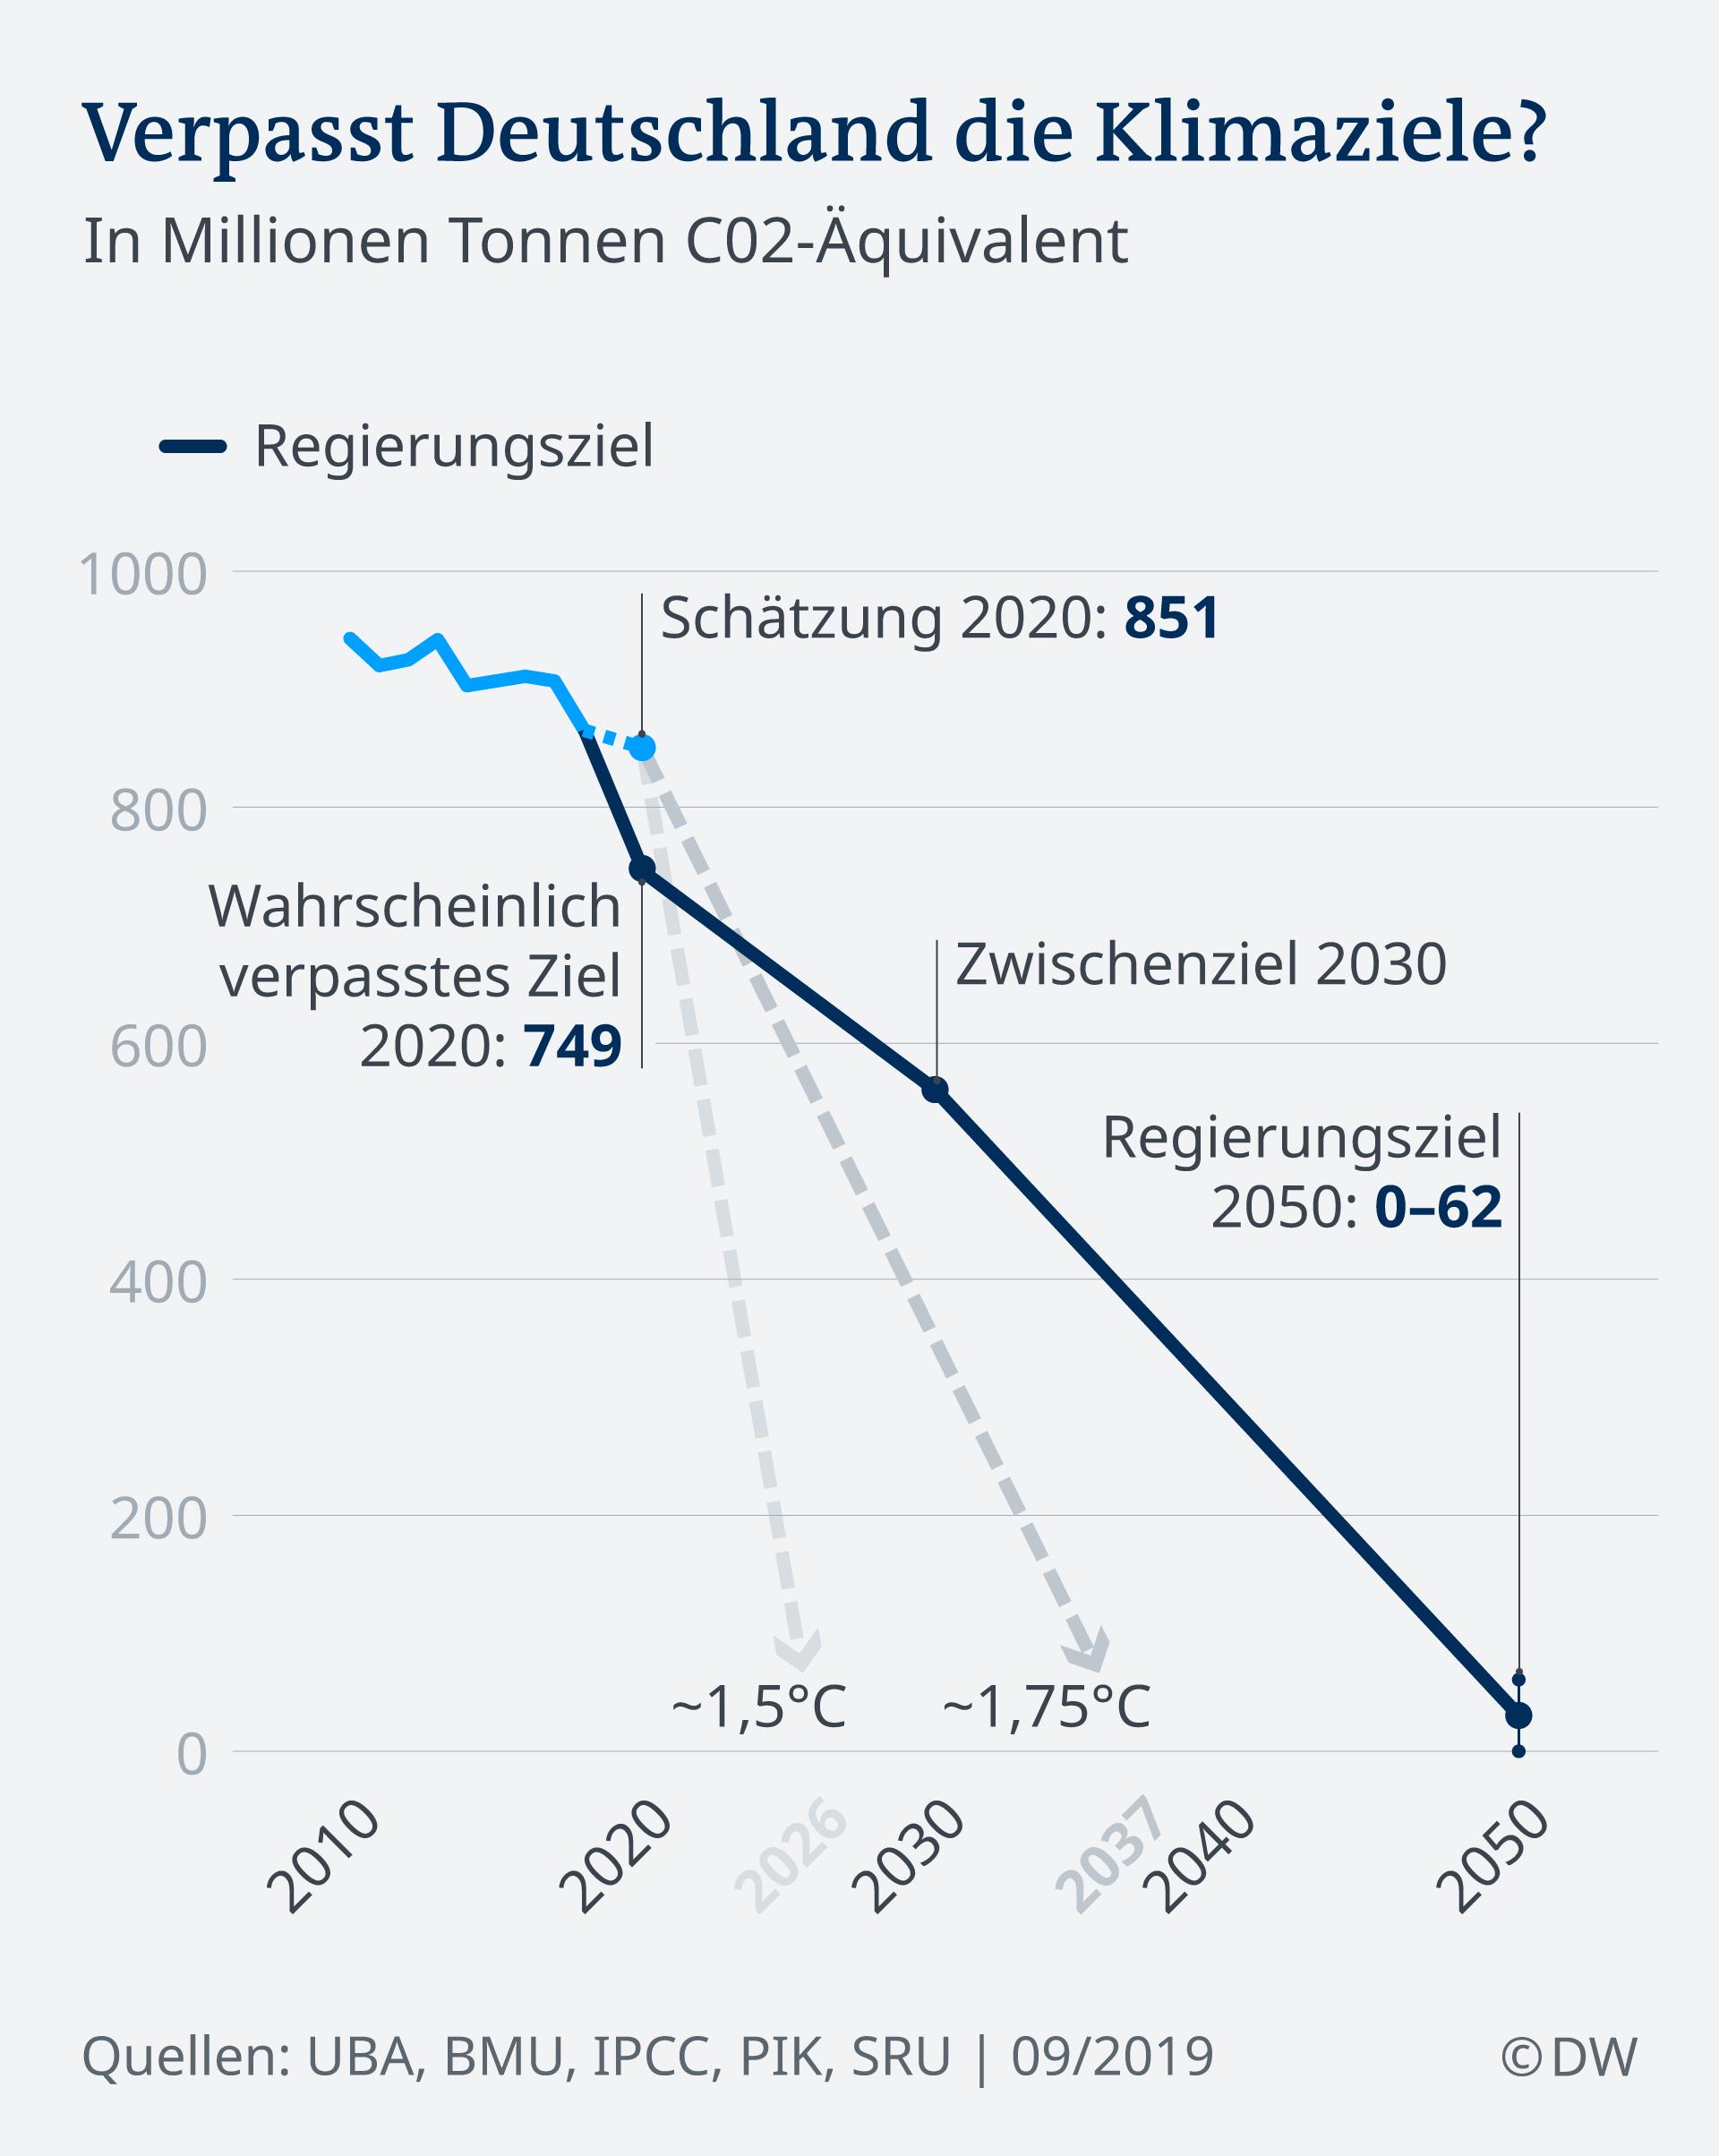 Infografik Verpasst Deutschland die Klimaziele? DE